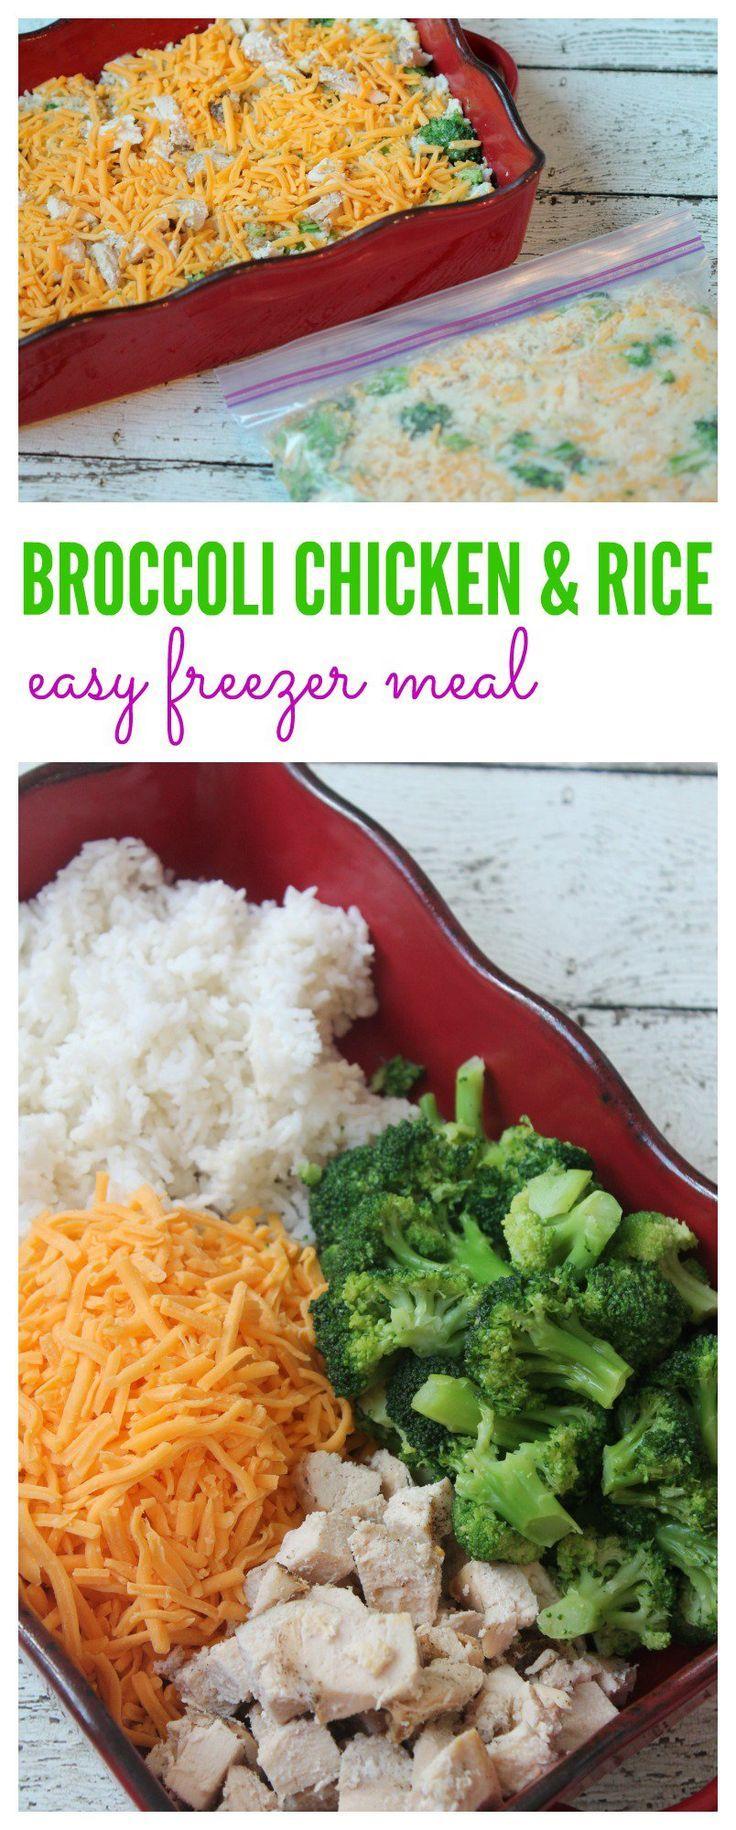 213 Best Freezer Meals Images On Pinterest  Freezer -3350